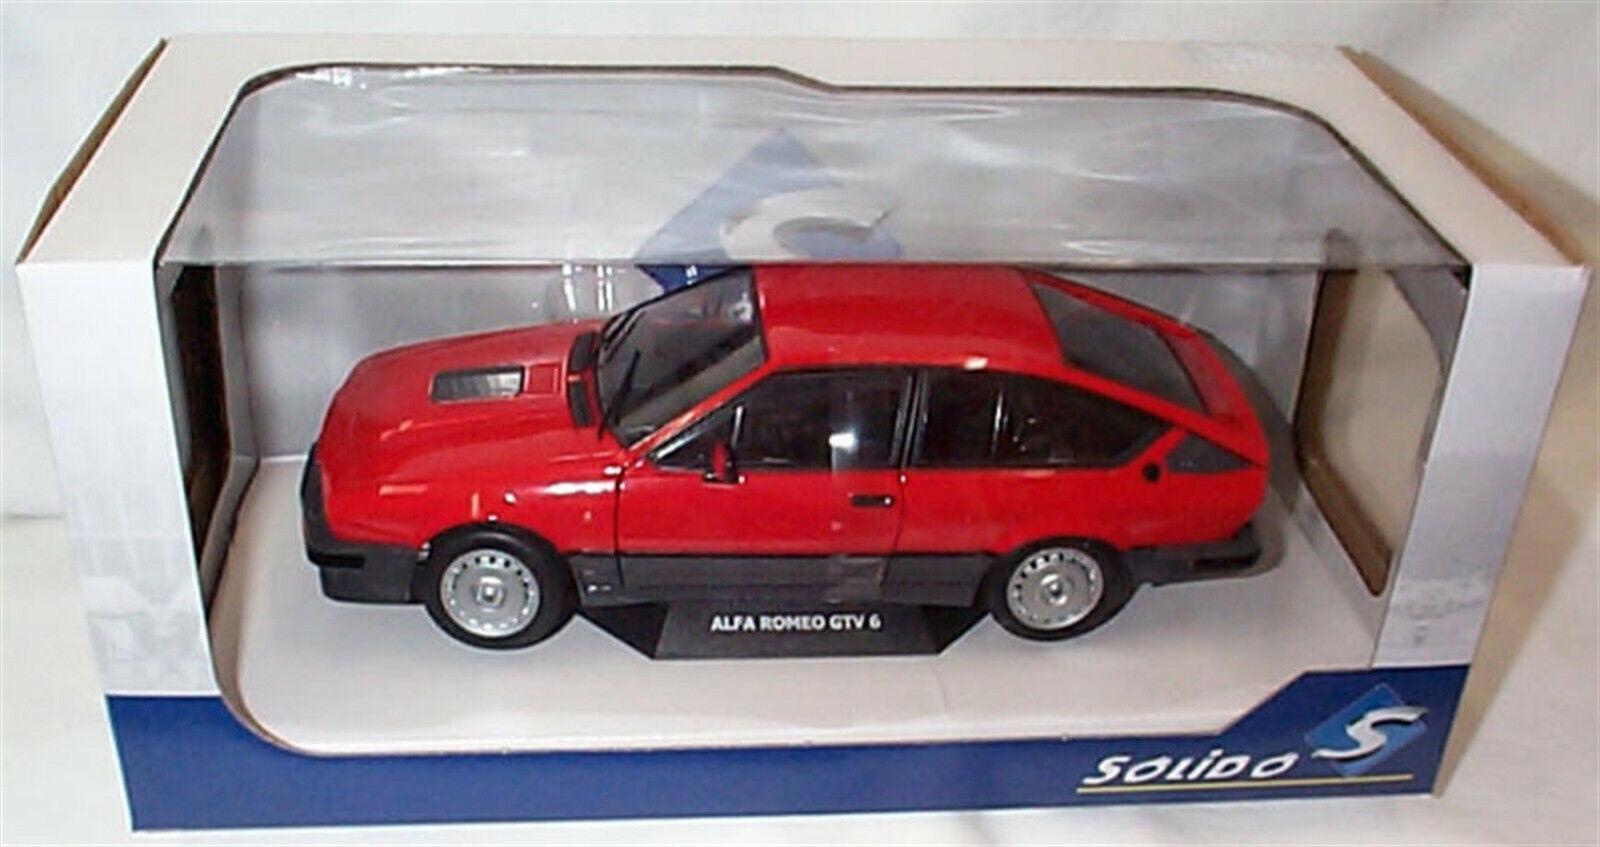 Alfa Romeo GTV 6 1984 in rot Opening Front Doors 1 18 - S1802301 SOLIDO